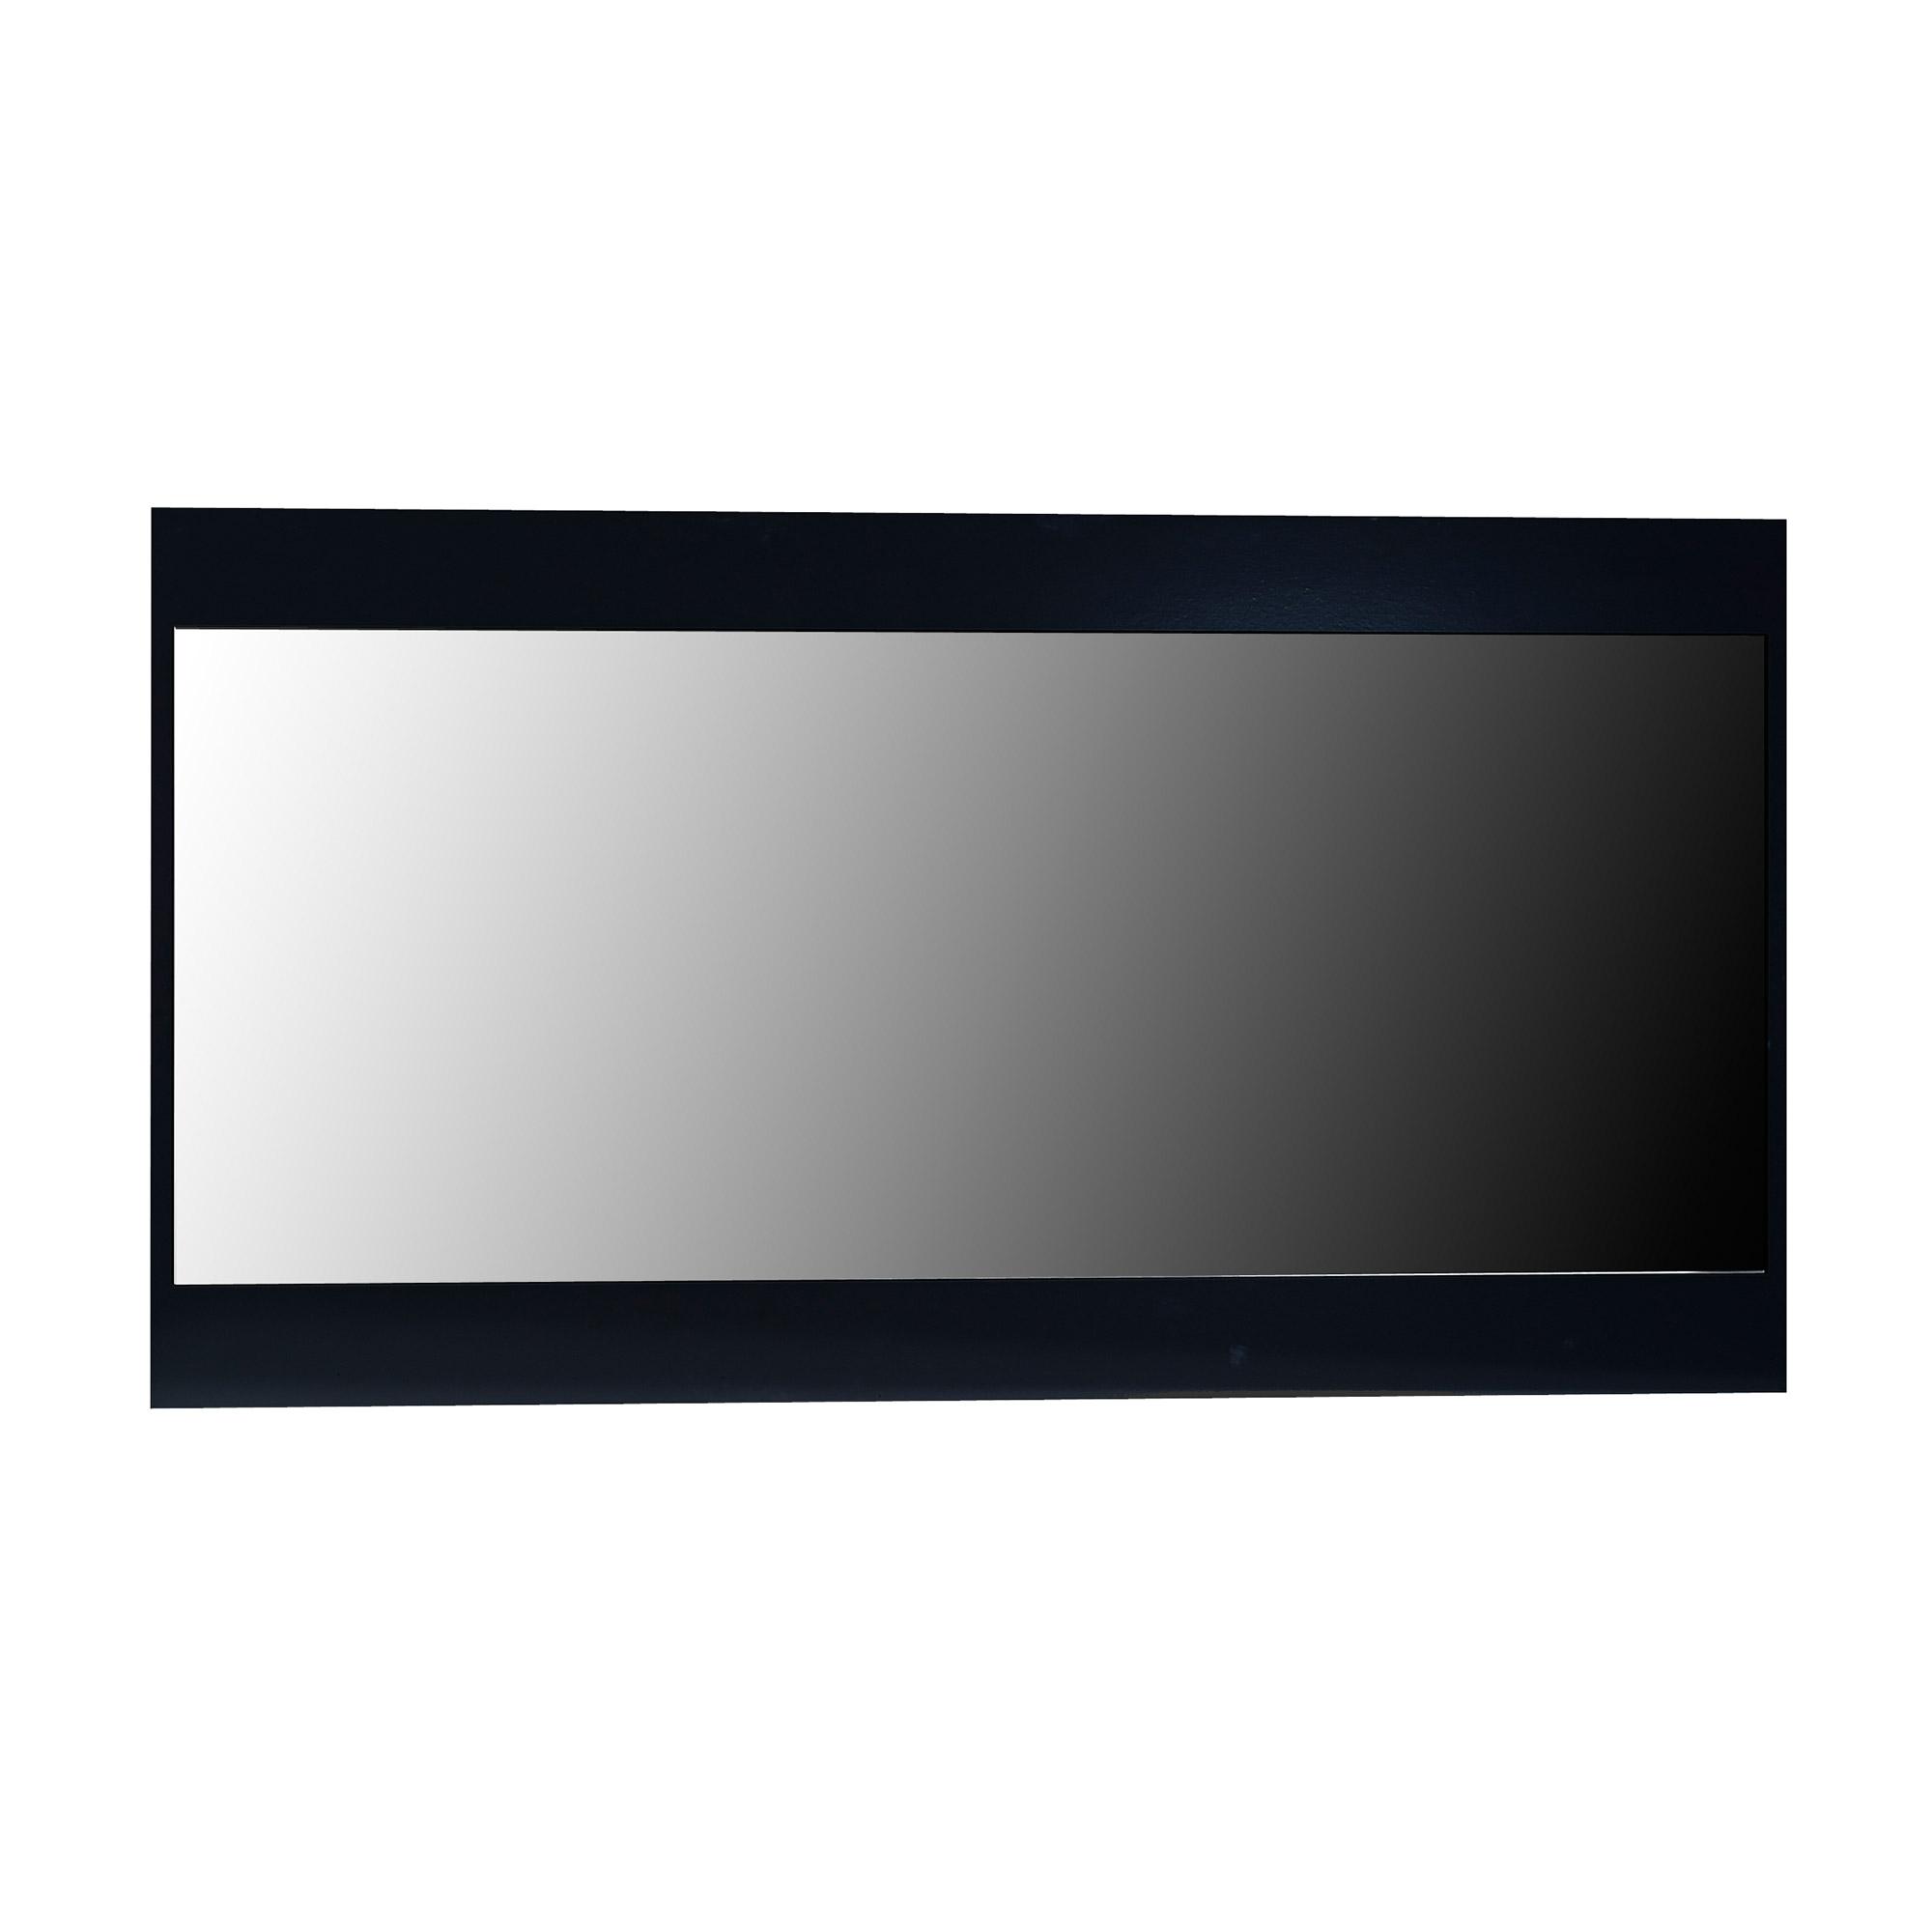 miroir rectangulaire en bois laqu noir first